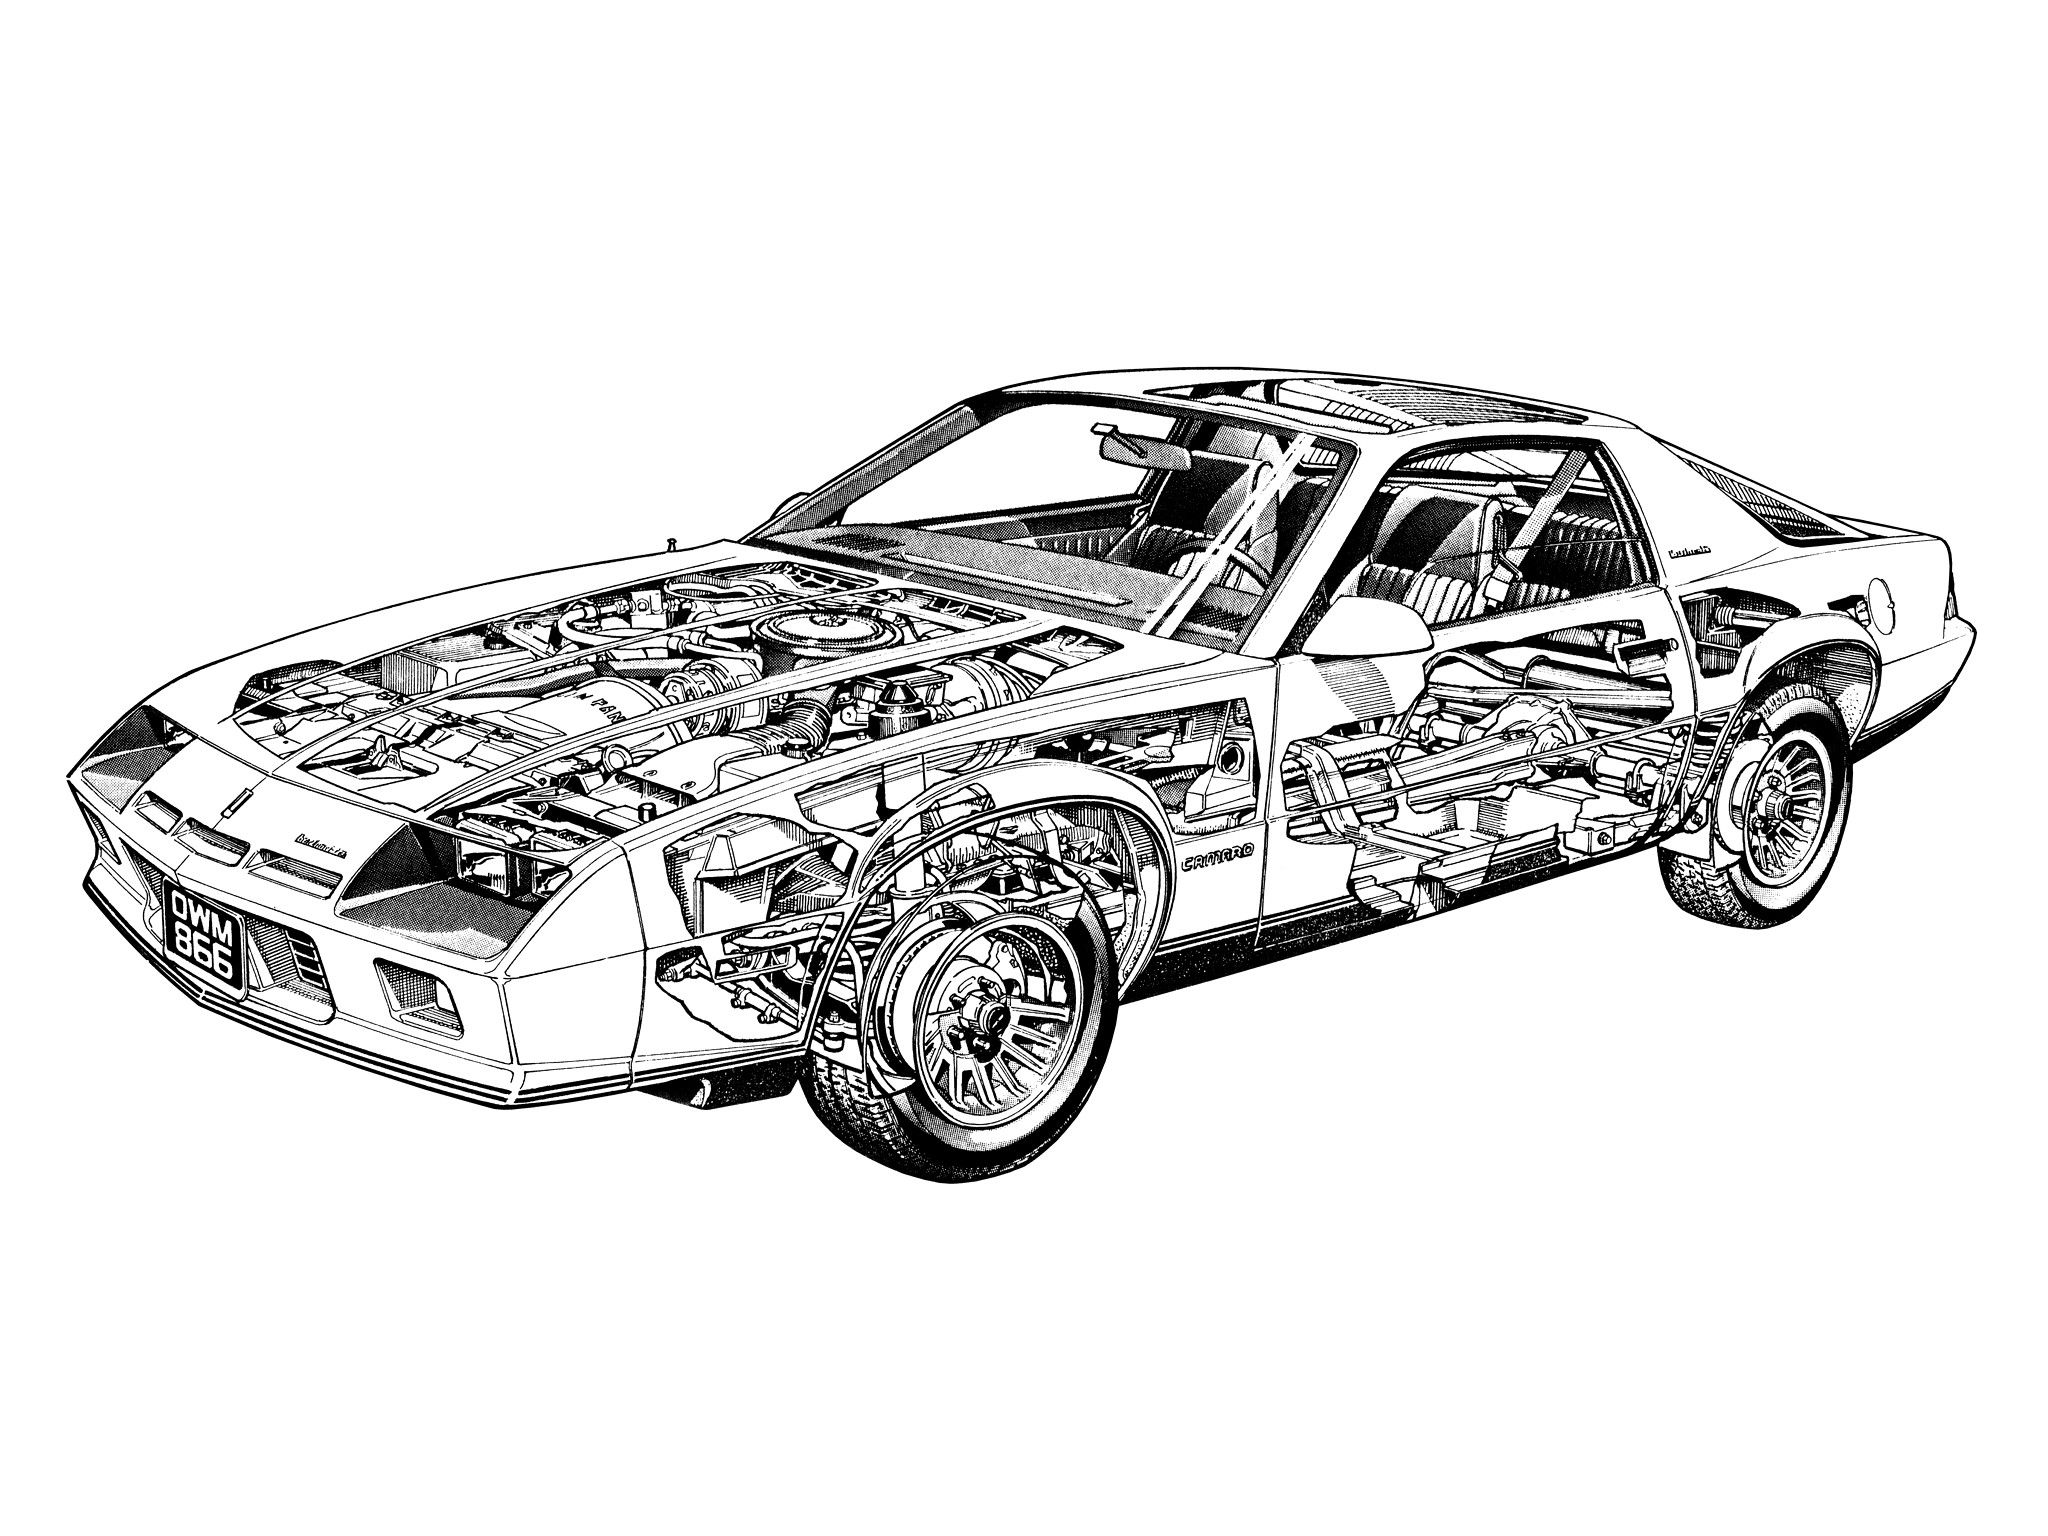 84 Chevrolet Camaro Berllinetta